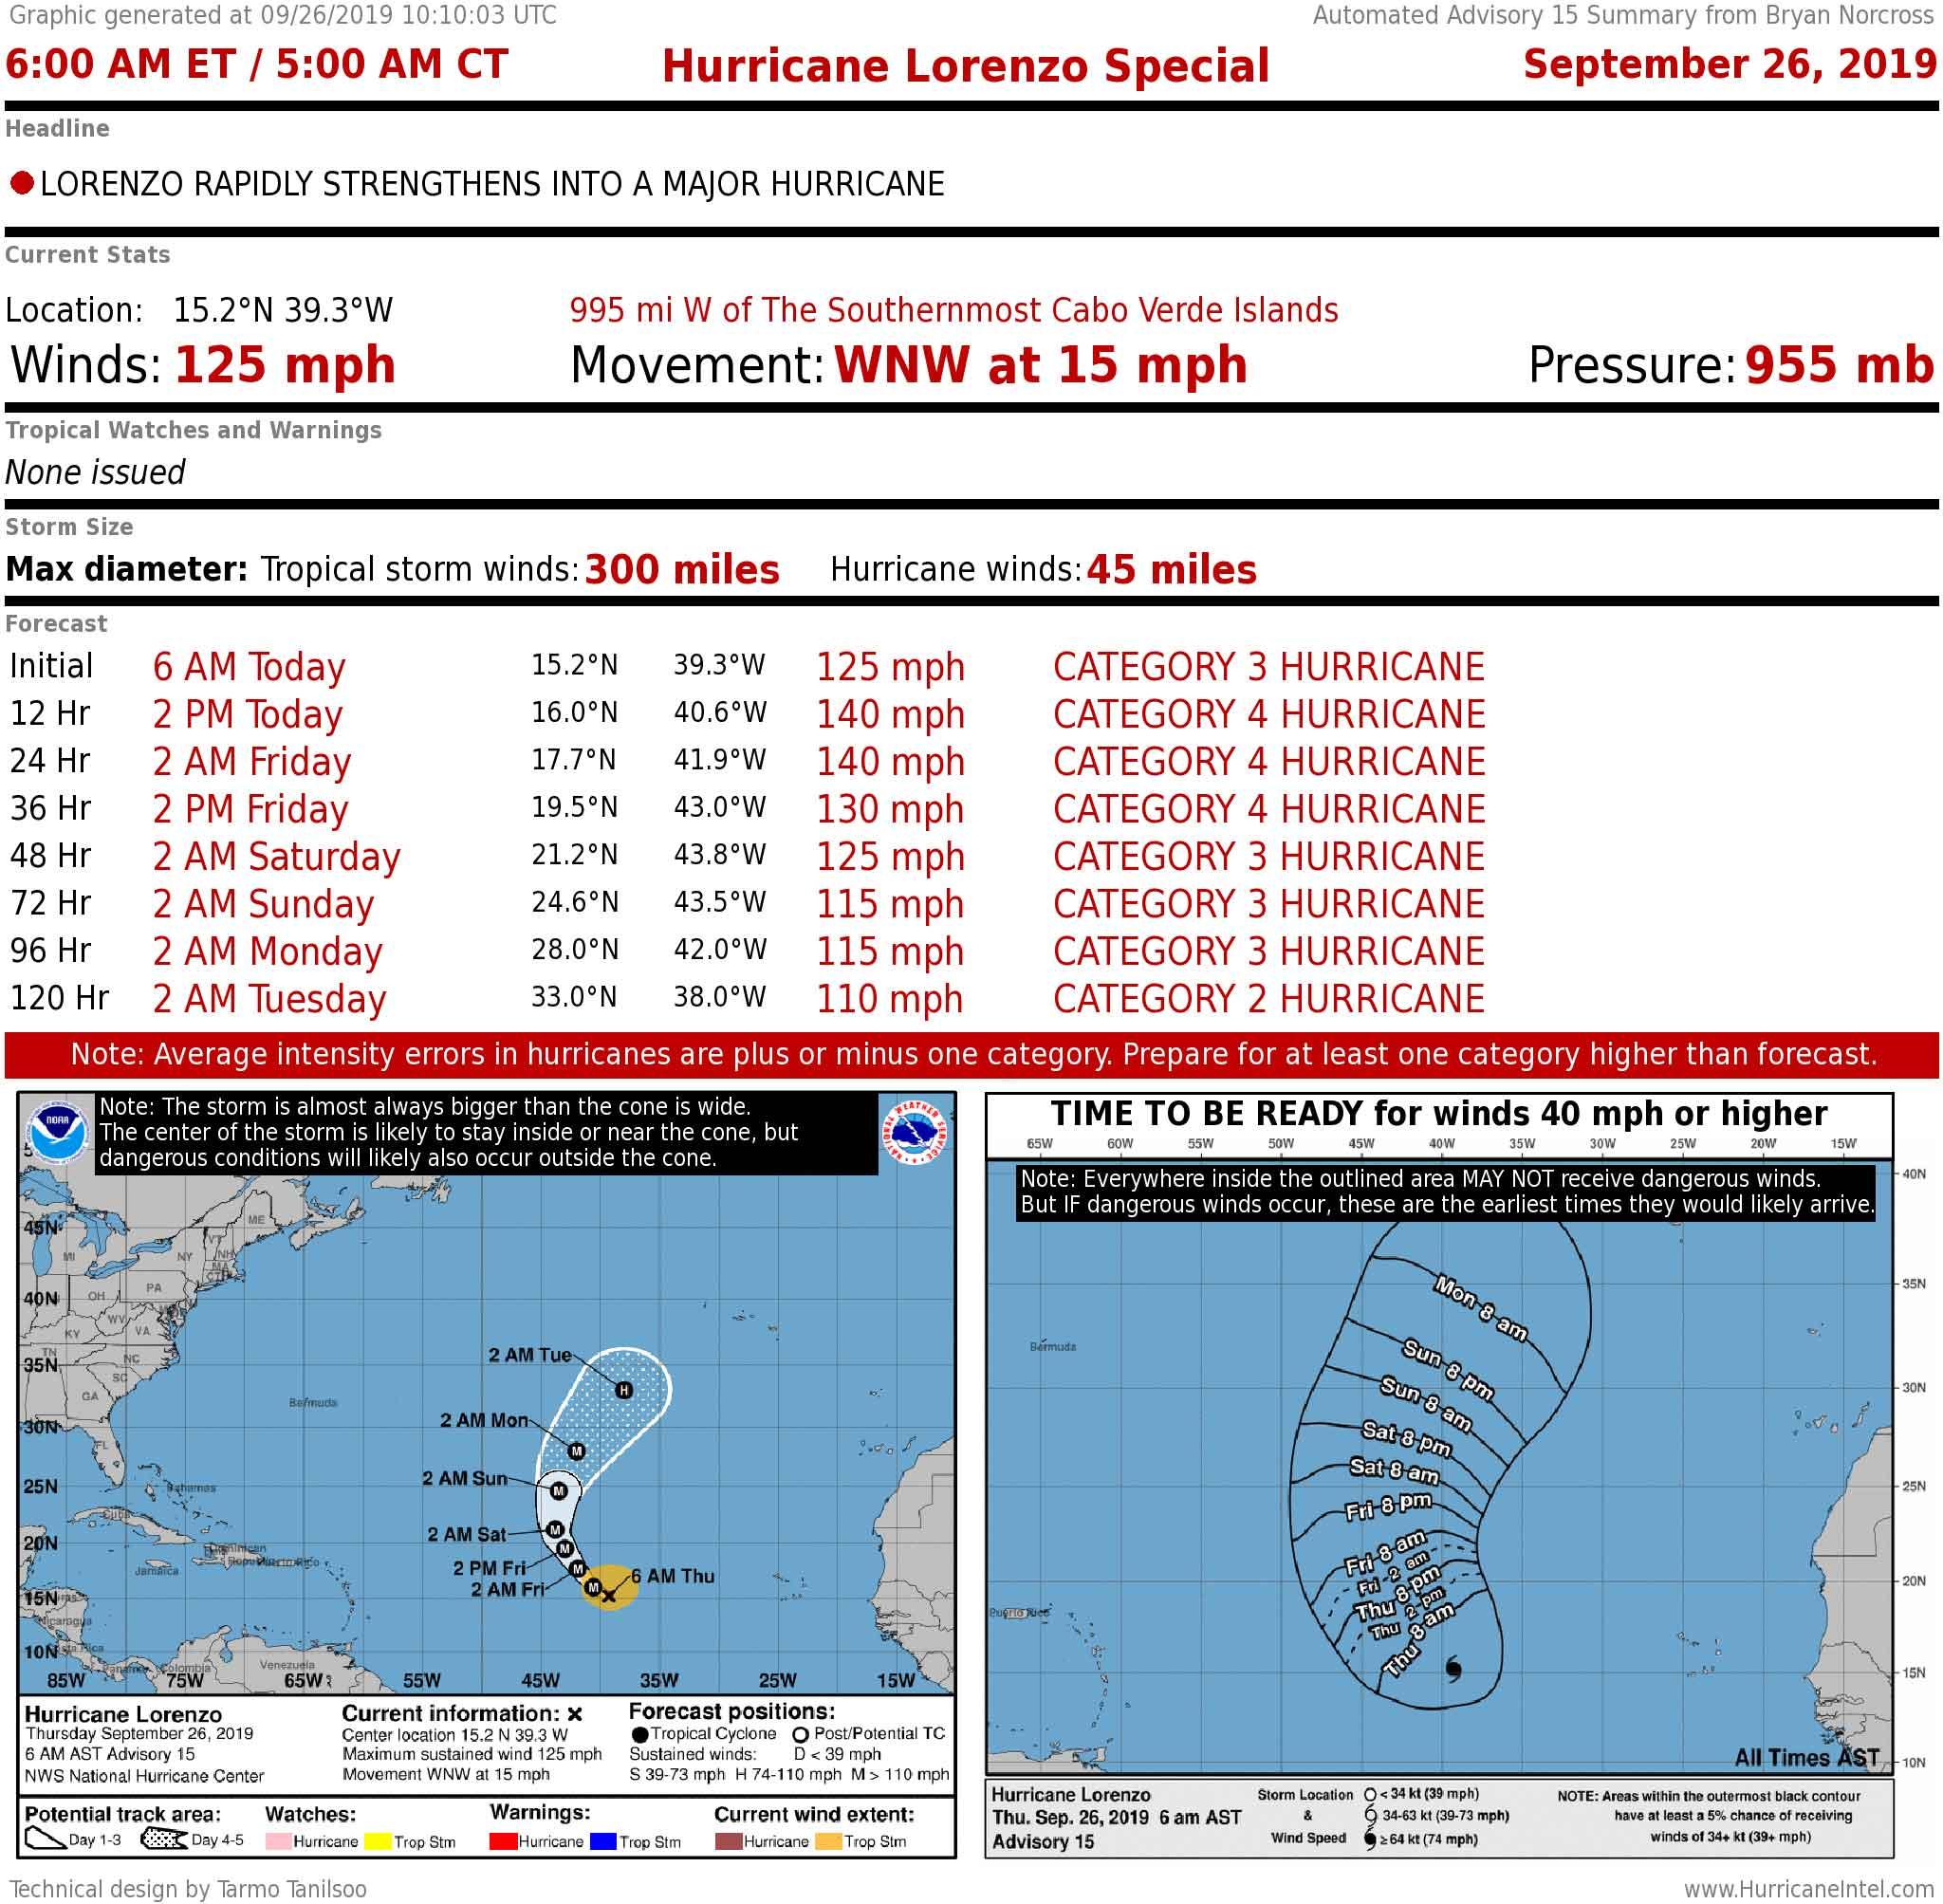 Tropical Storm Karen Weakens while Hurricane Lorenzo Strengthens